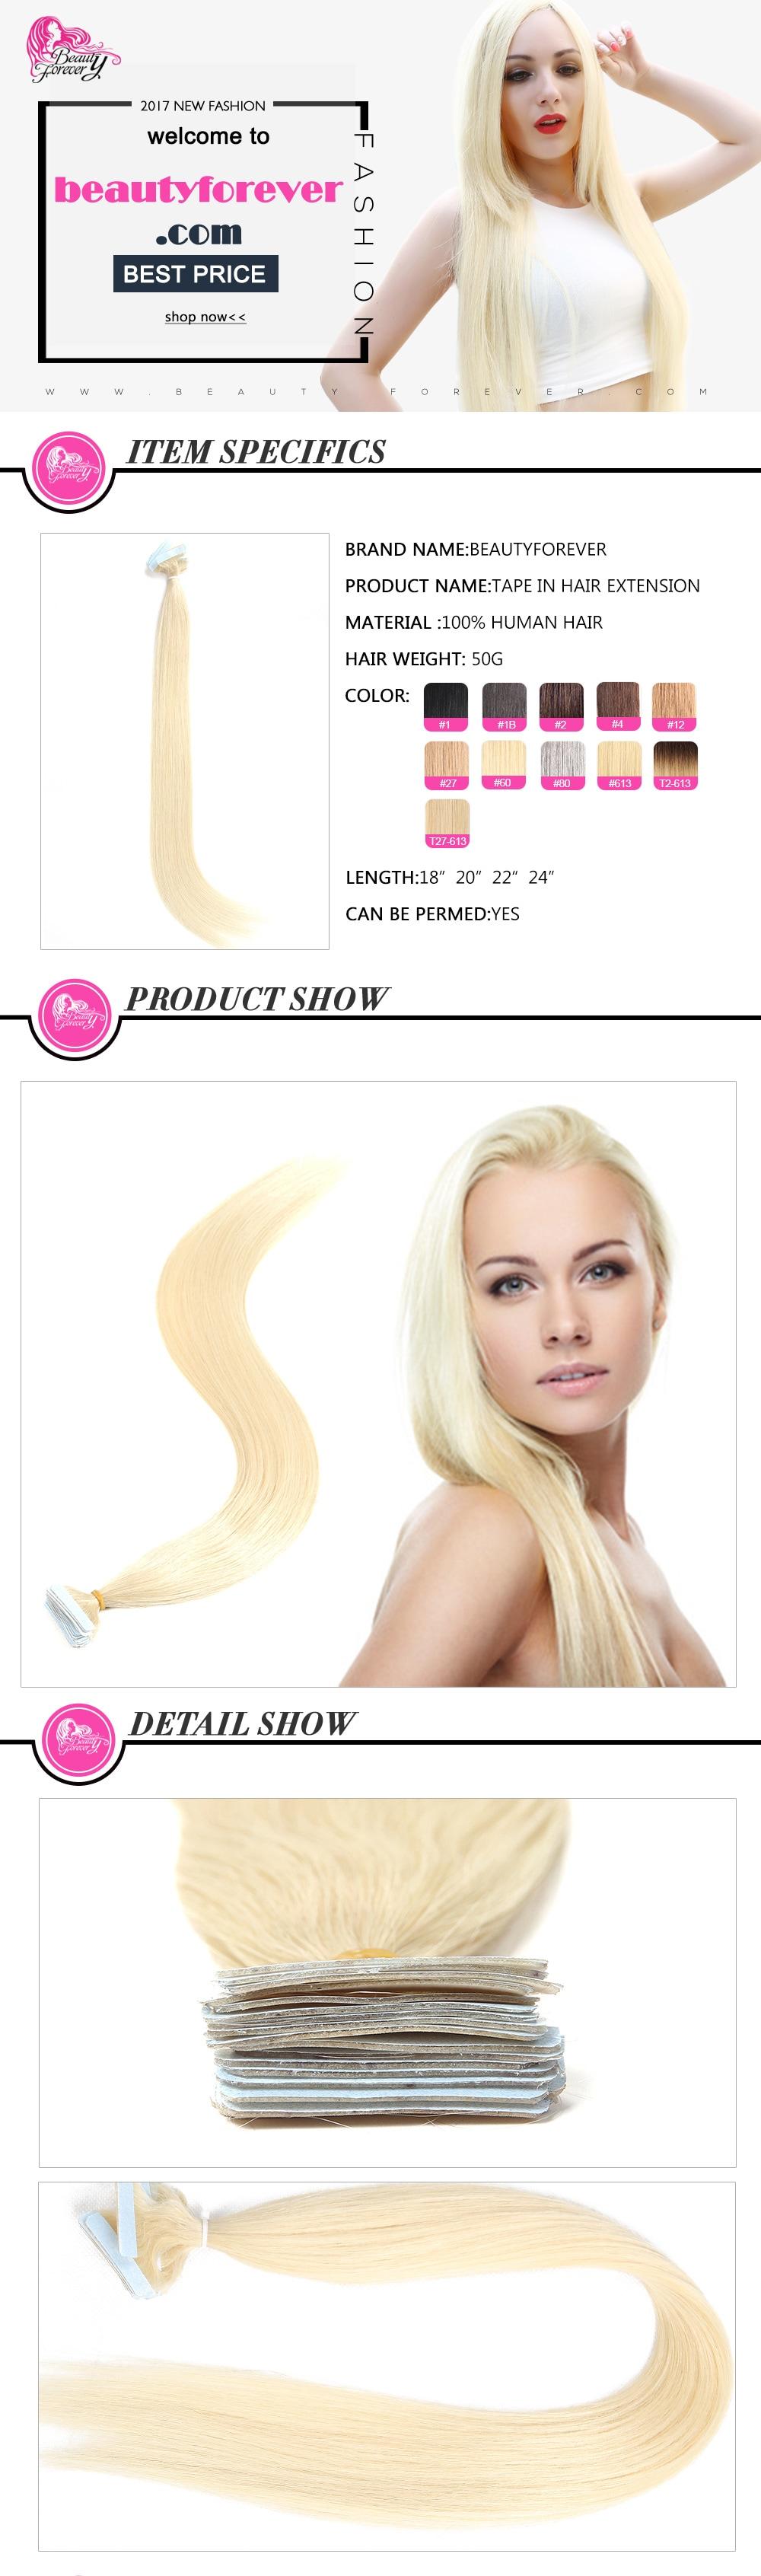 Brazilian Pu Hair Extensions